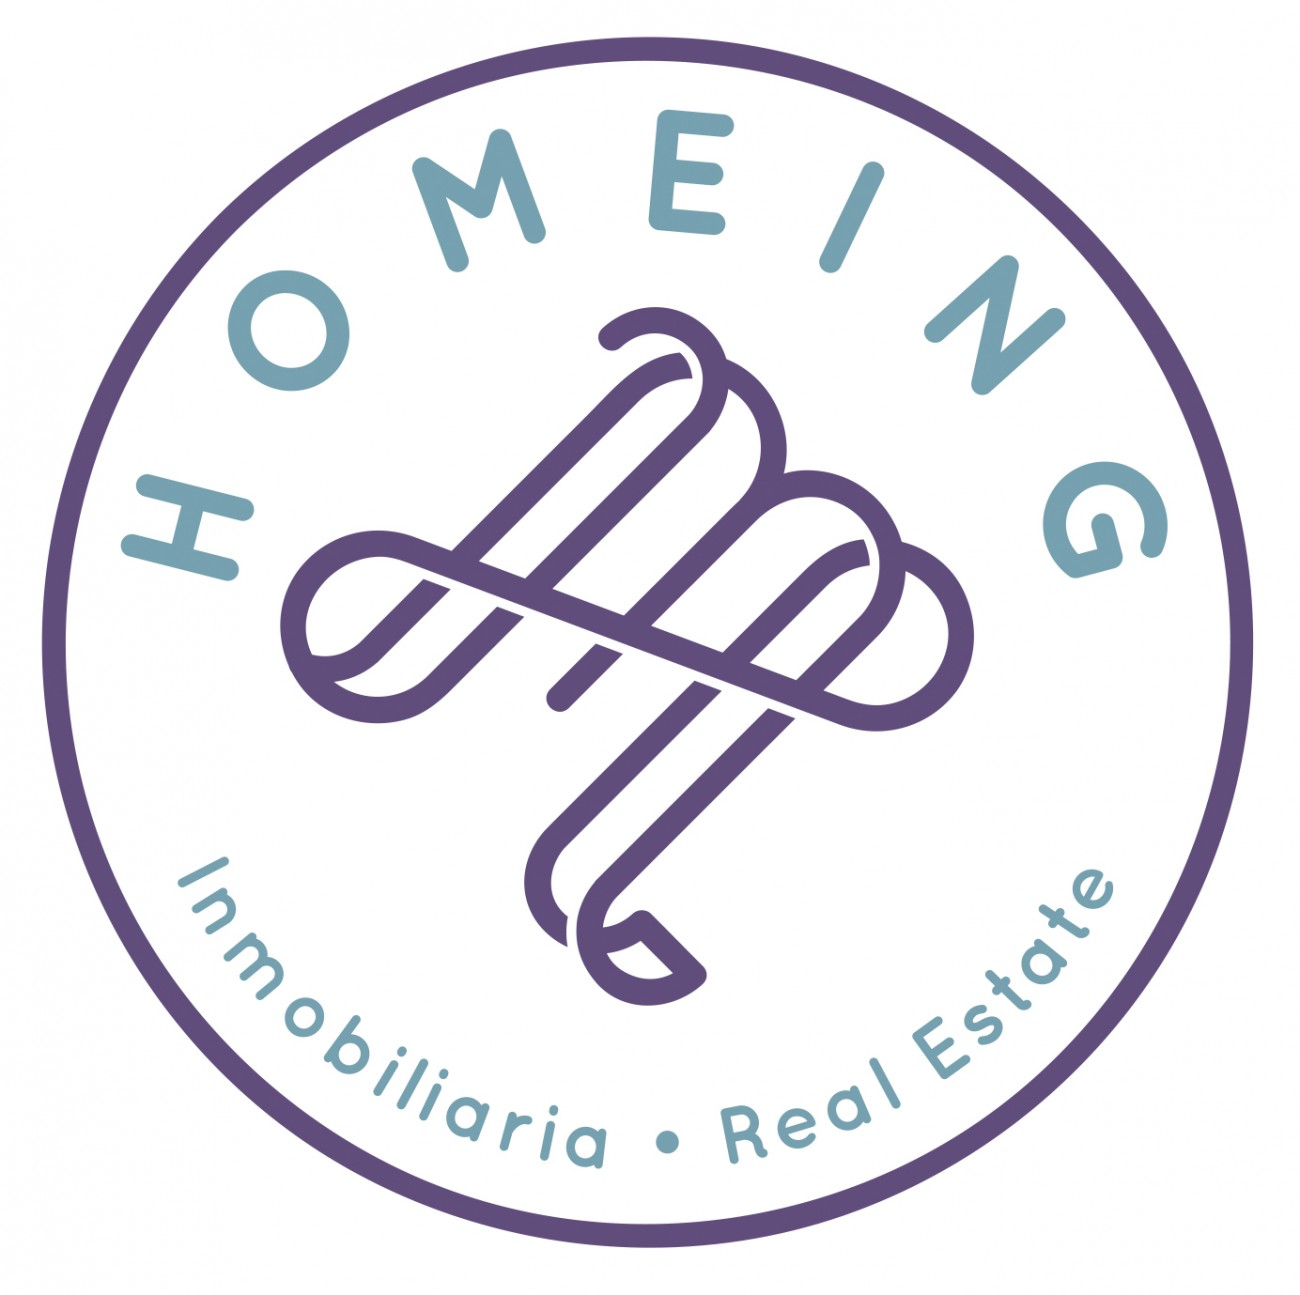 homeing_logo_circulo